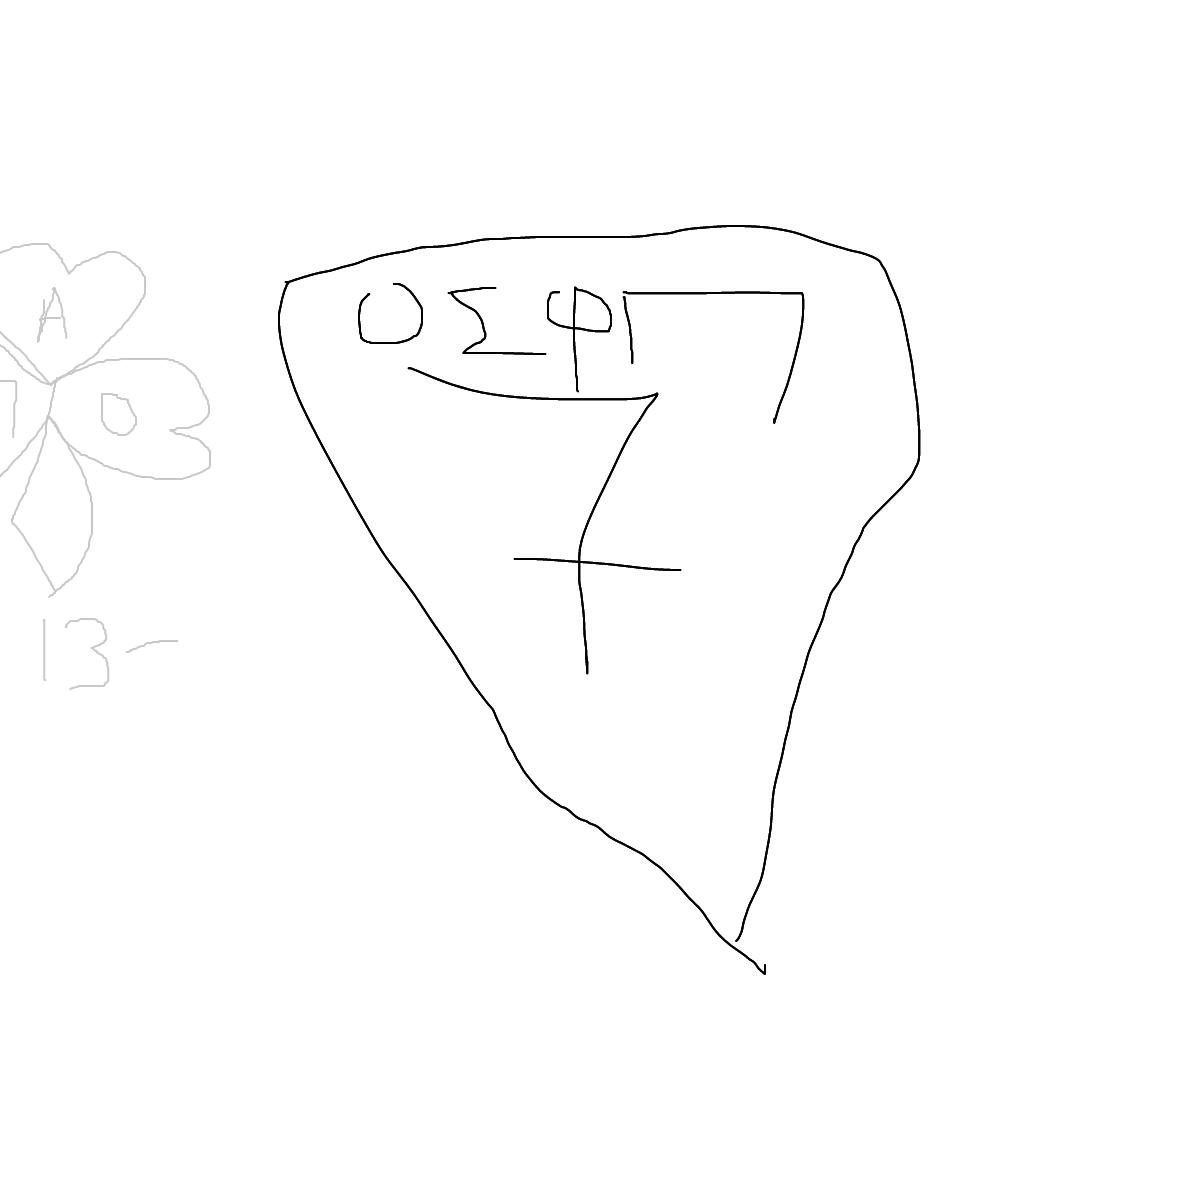 BAAAM drawing#5451 lat:38.0477027893066400lng: 23.7638397216796880